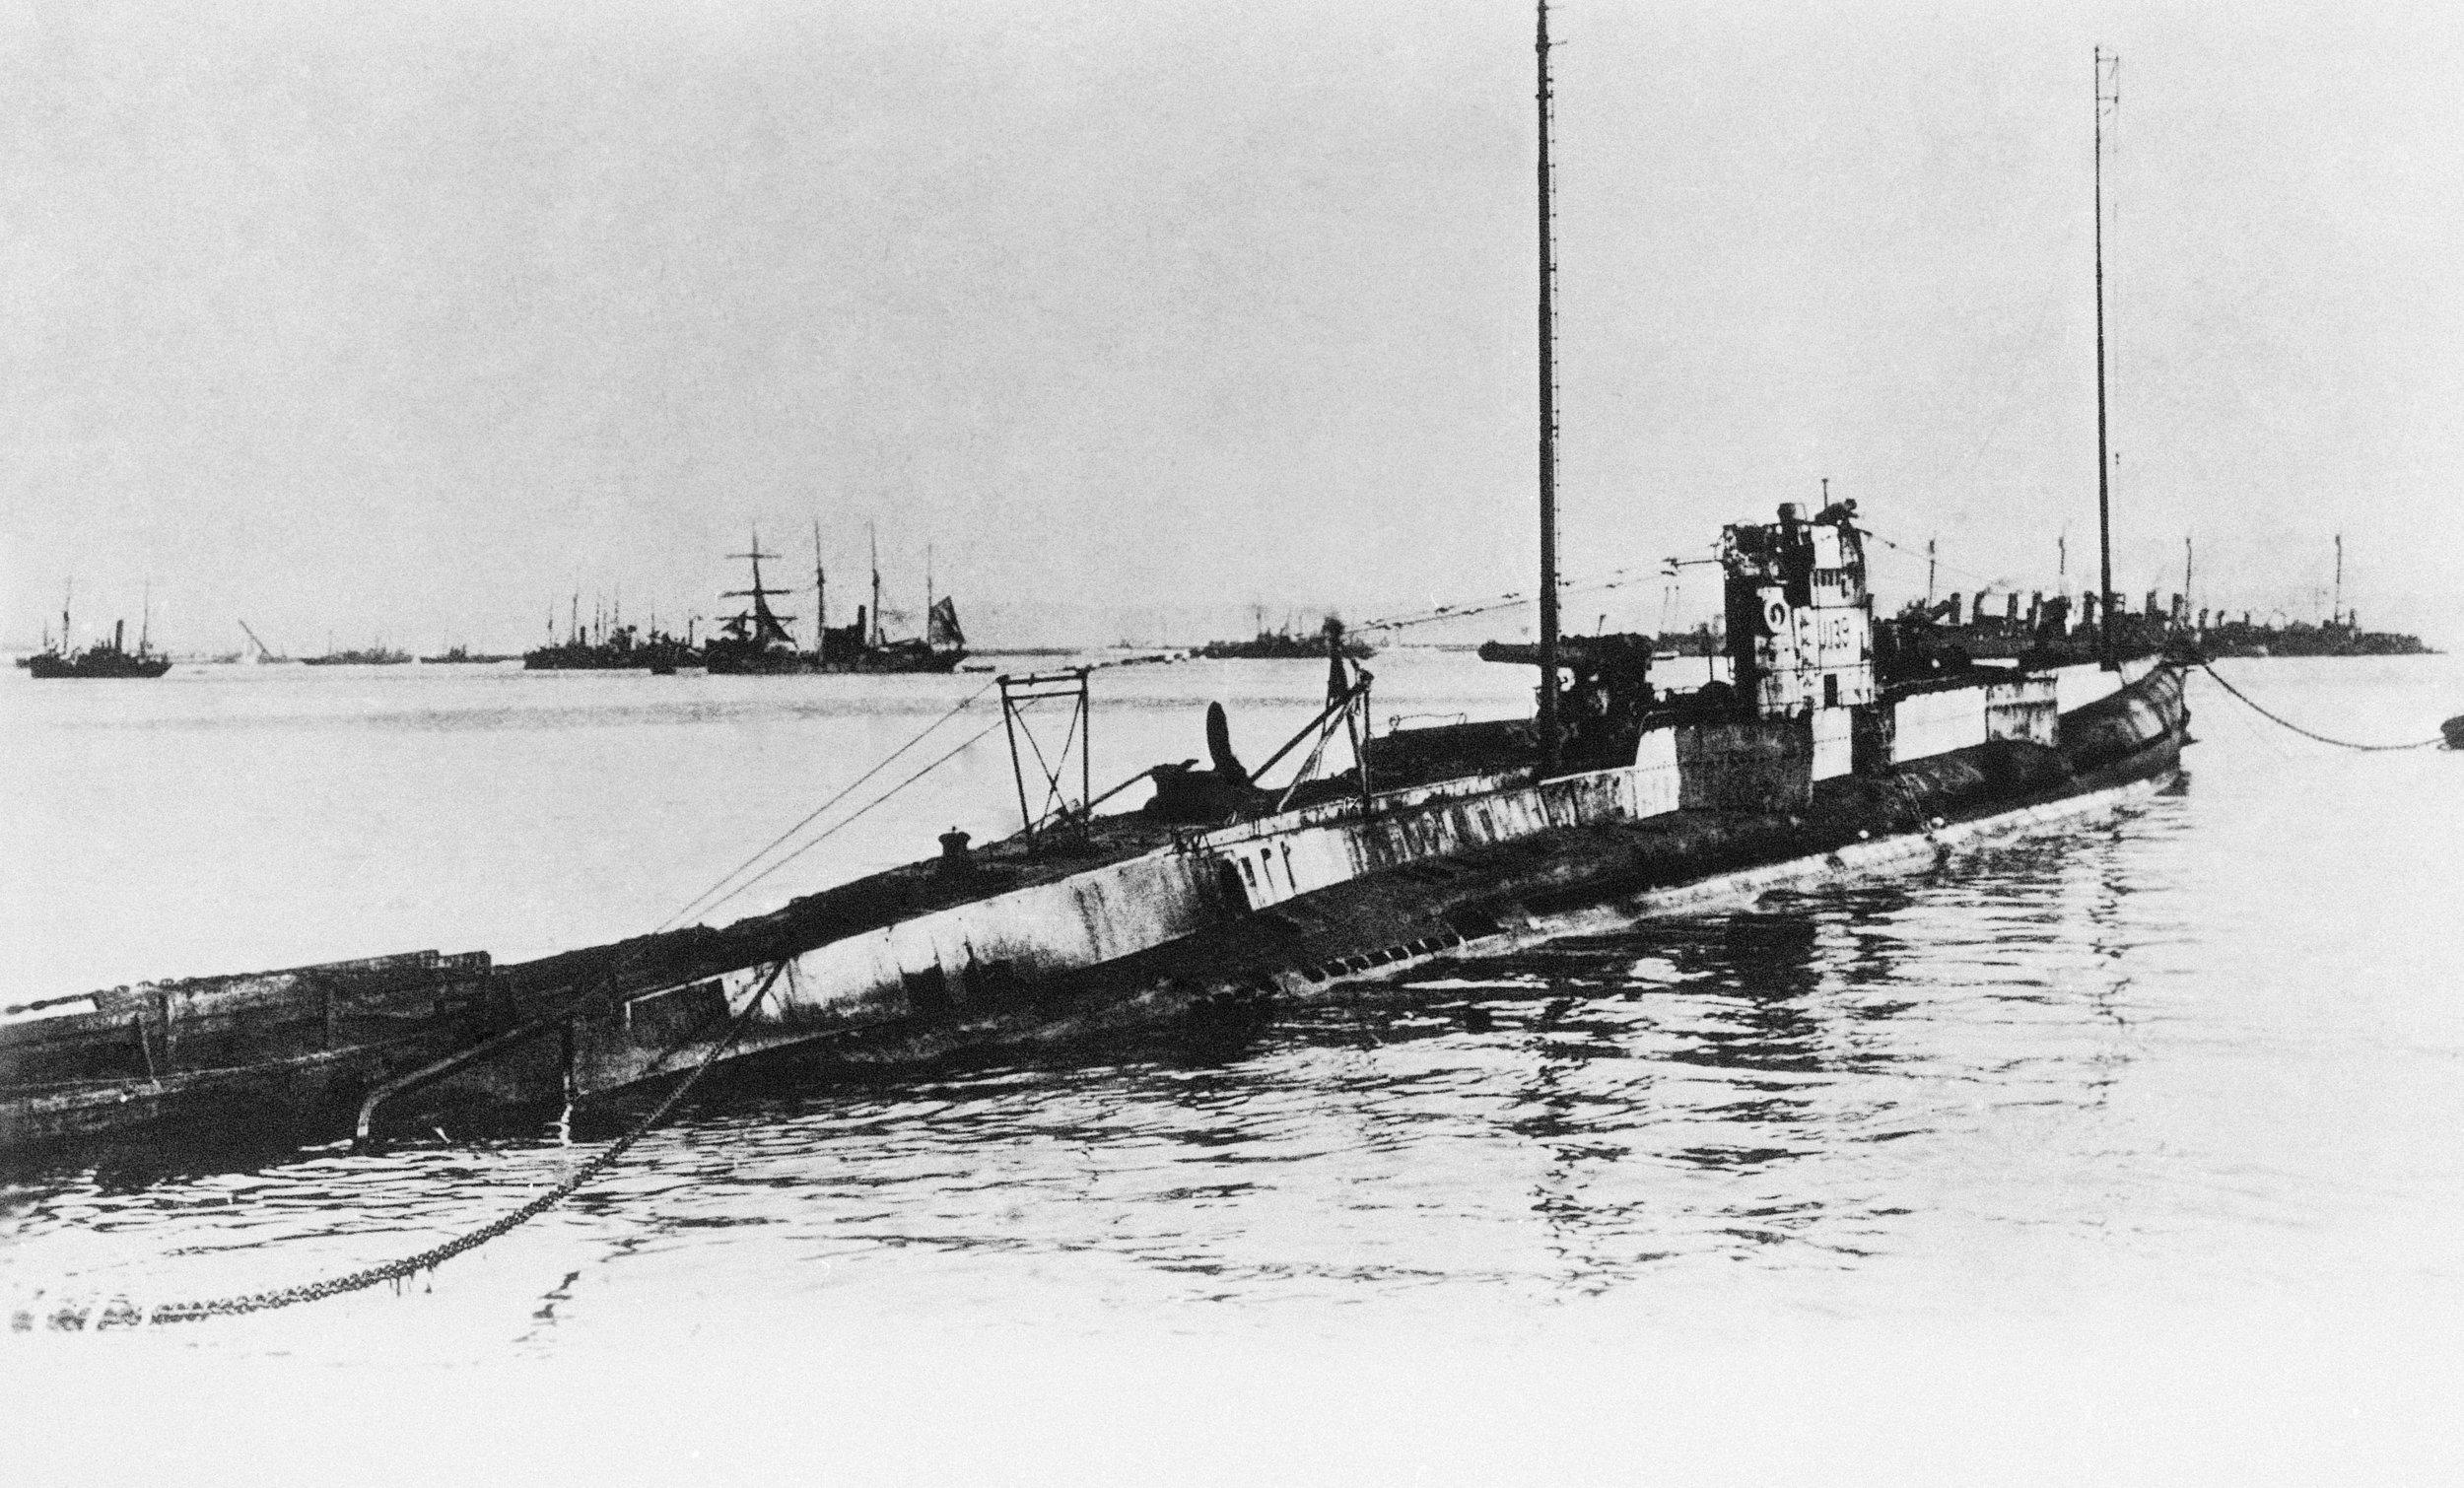 A German U-boat, similar to the one that sunk a British tanker near the Rockaways in 1942. (AP Photo).